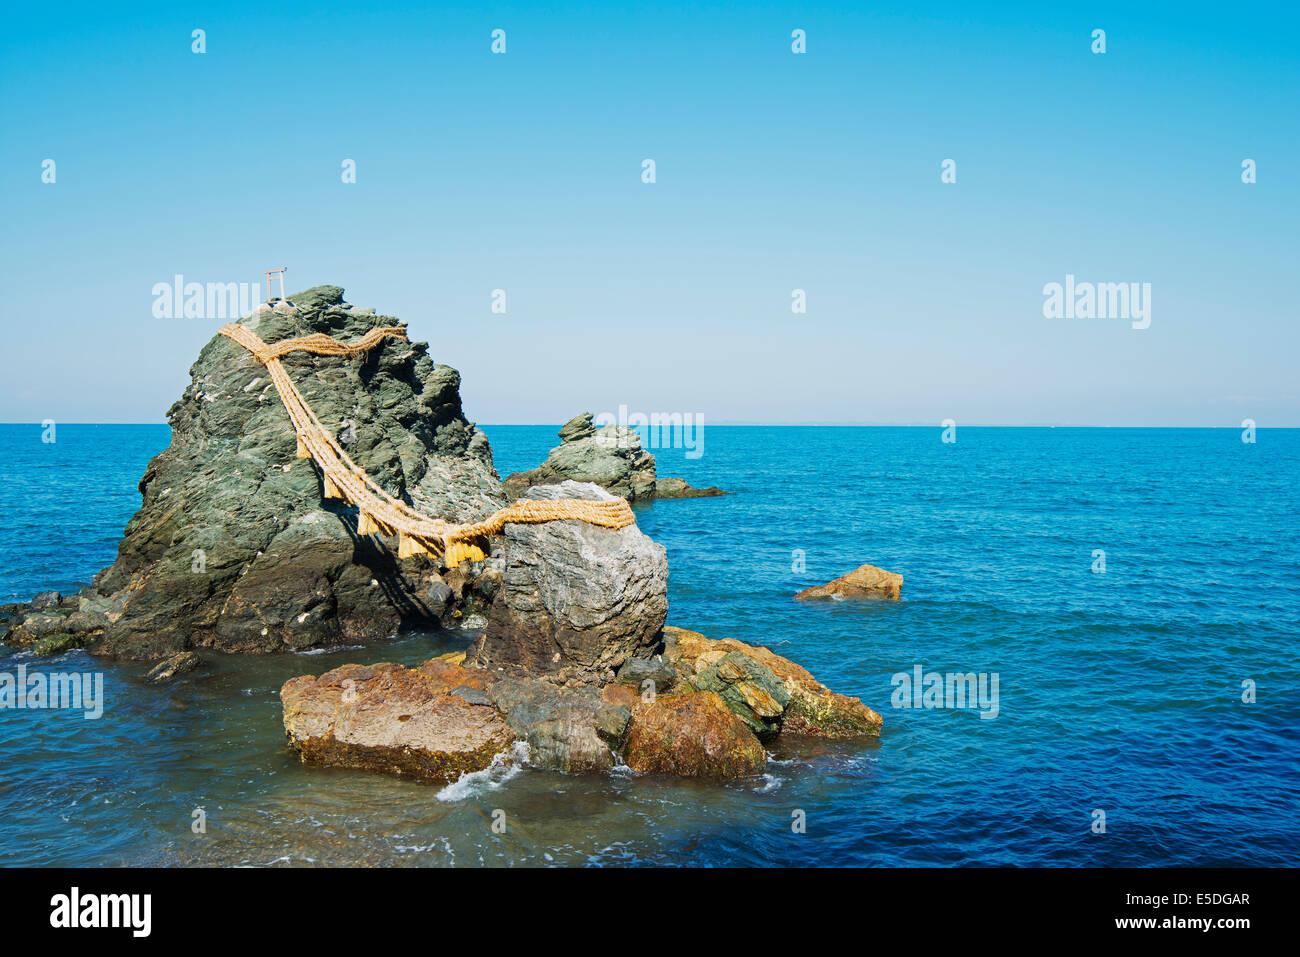 Asia, Japan, Honshu, Mie prefecture, Futaminoura rocks, Meoto-Iwa (Wedded Rocks), - Stock Image